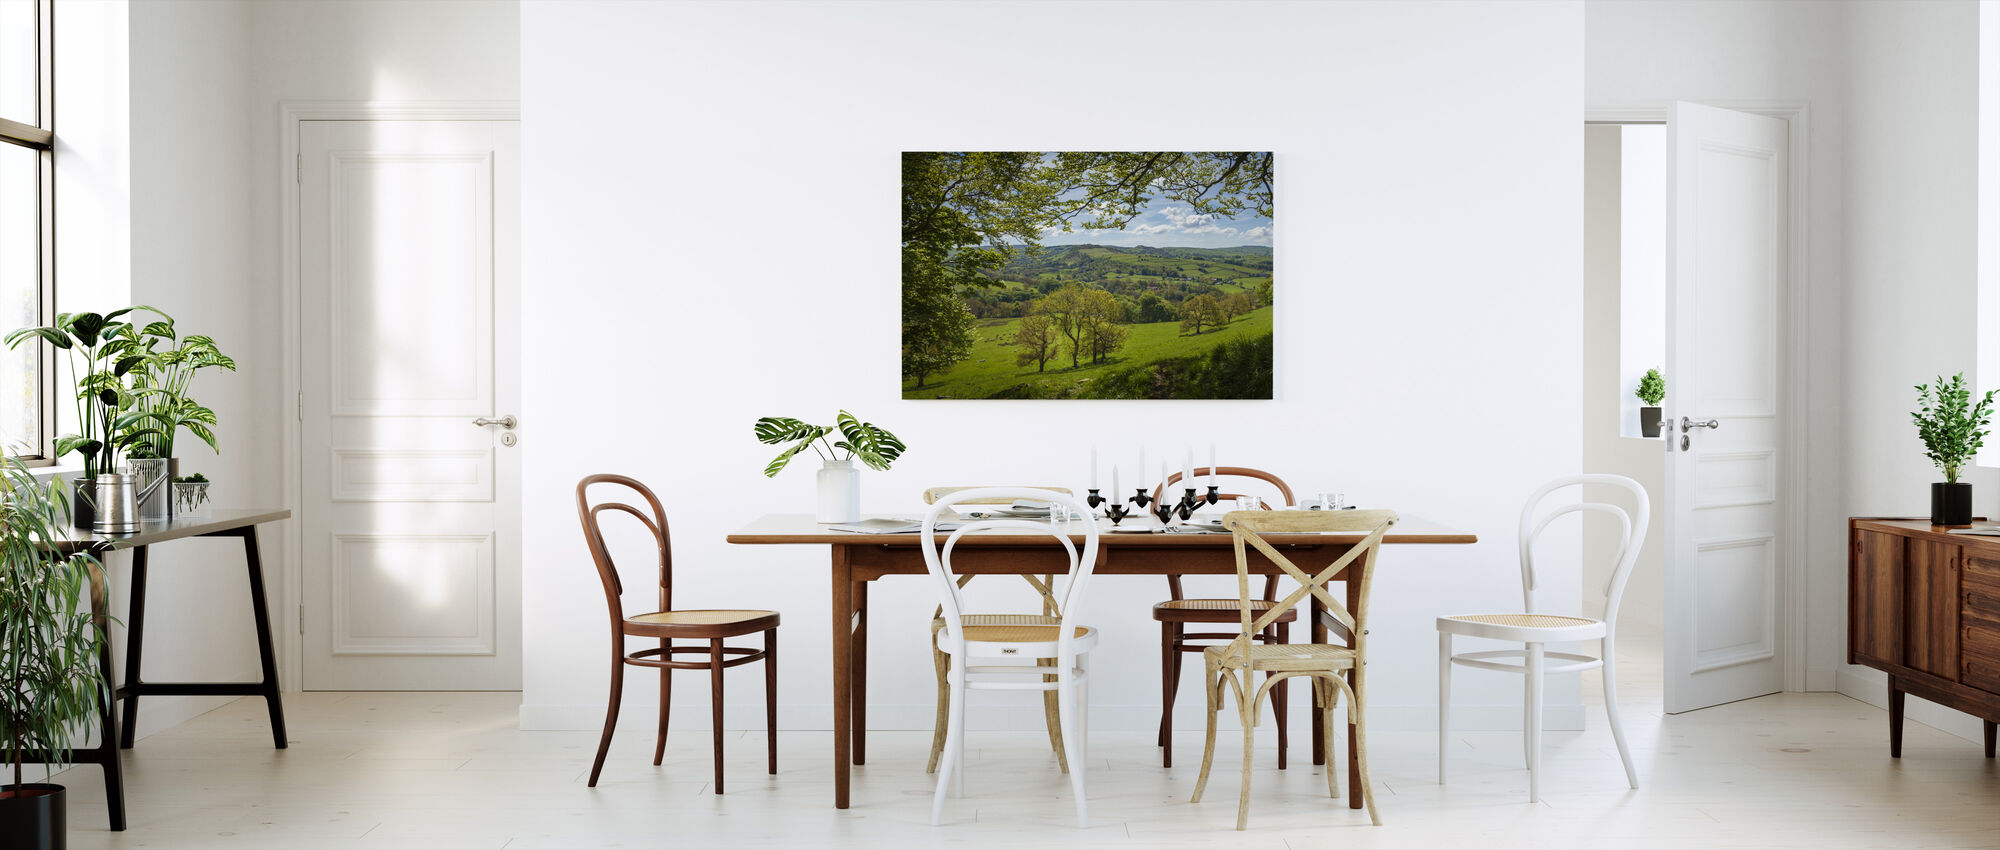 English Country Scene - Canvas print - Kitchen